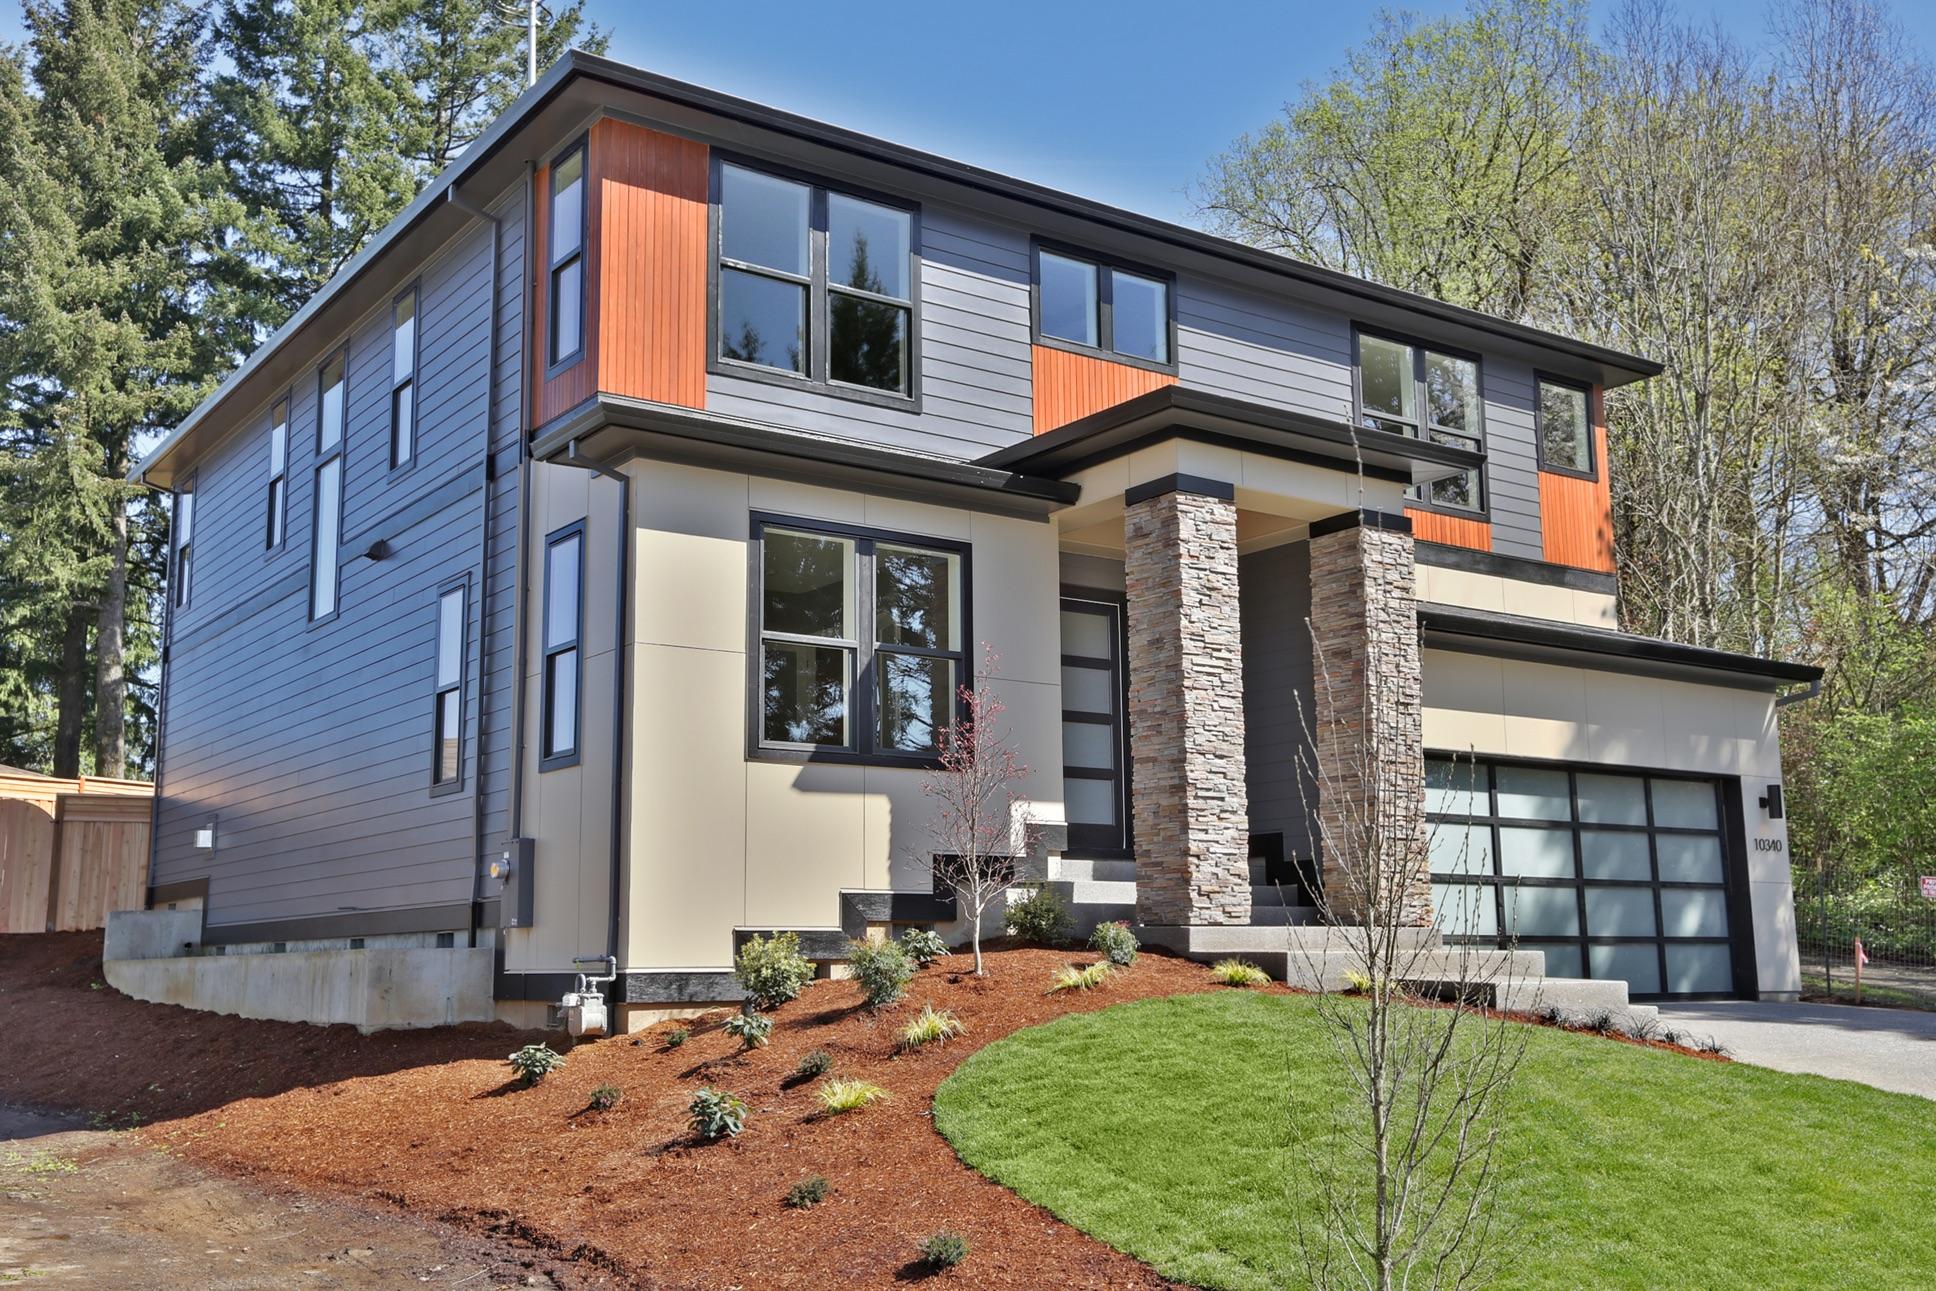 Build a custom home with Mainstreet development